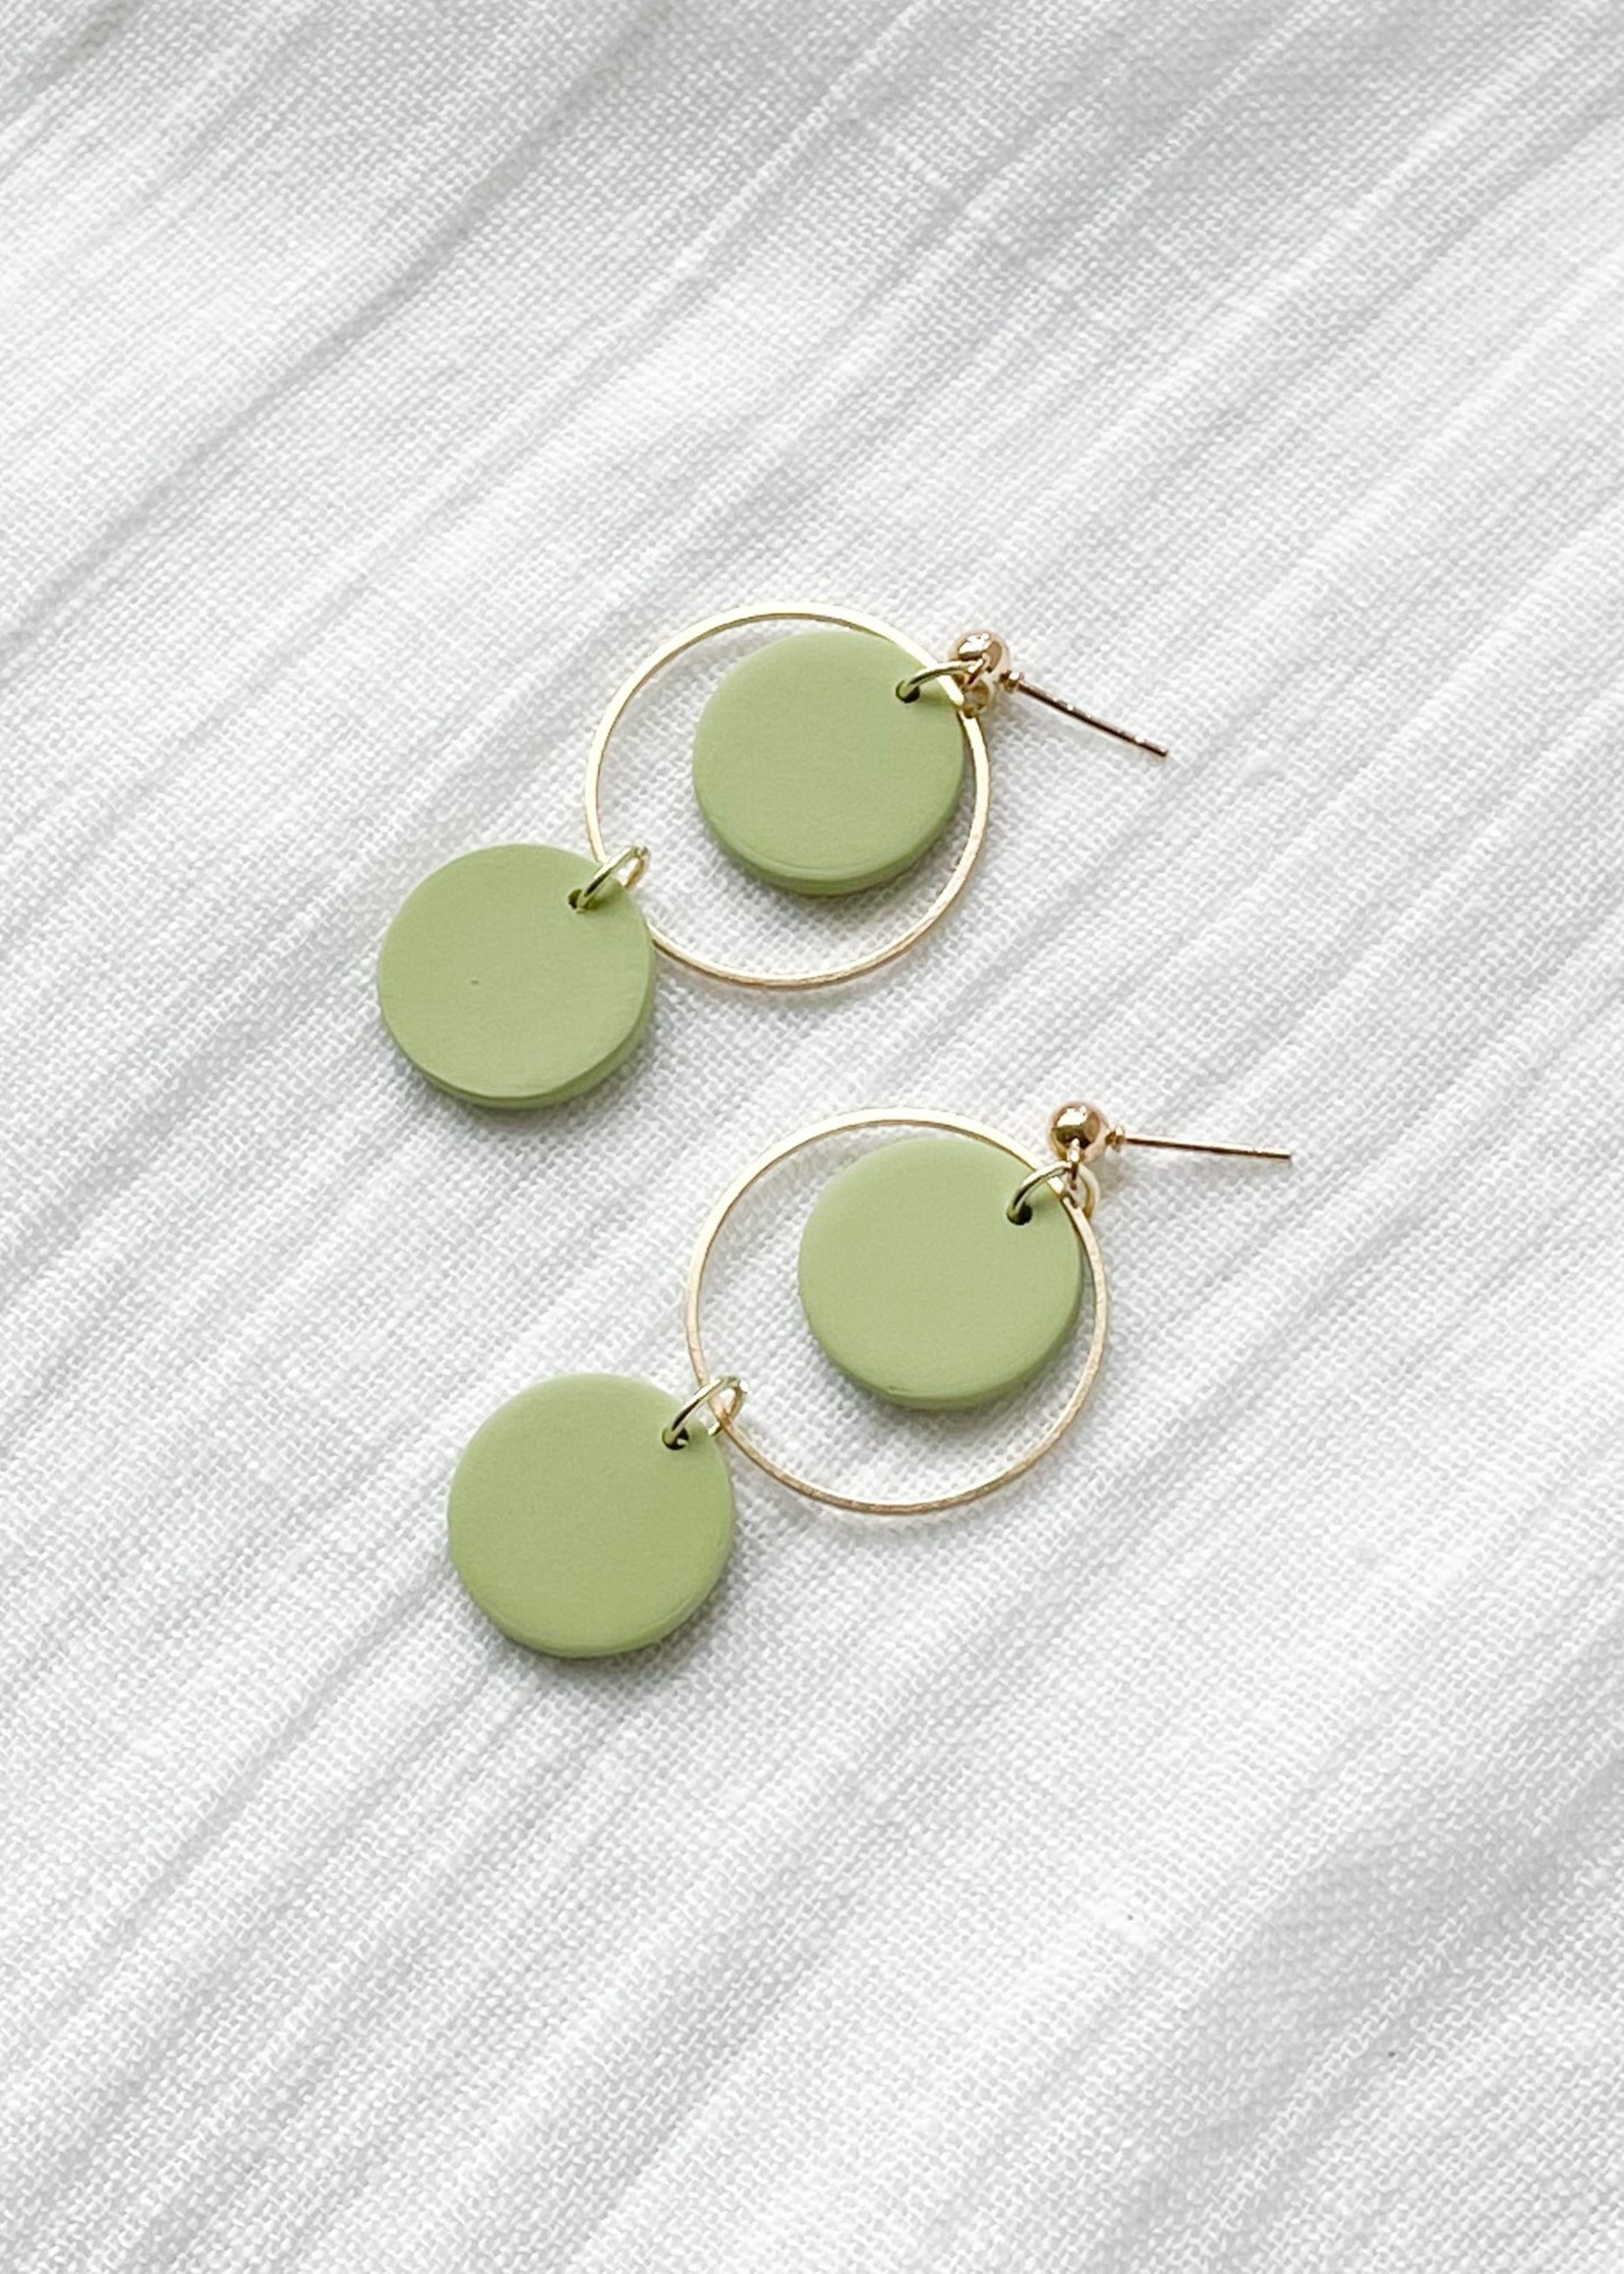 Kaju Jewerly Creations Kaju - Mini Hoops - Lime